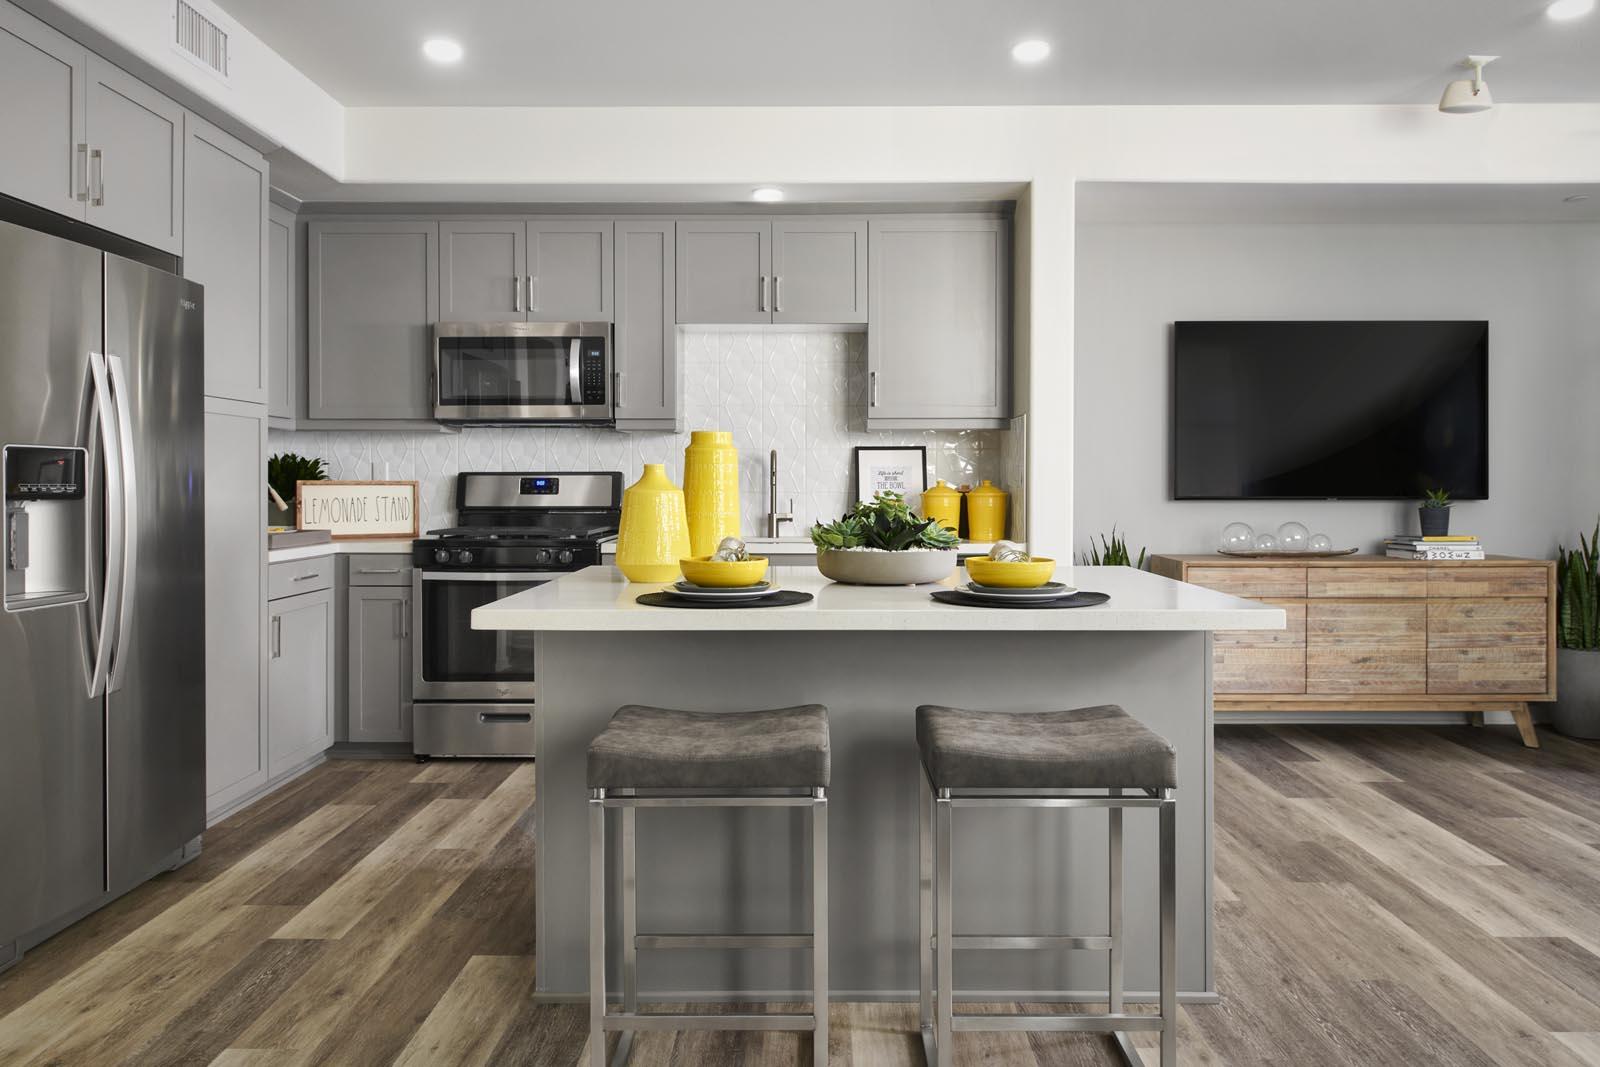 Kitchen | Residence 1 | Aspire | New Homes in Rancho Cucamonga, CA | Van Daele Homes